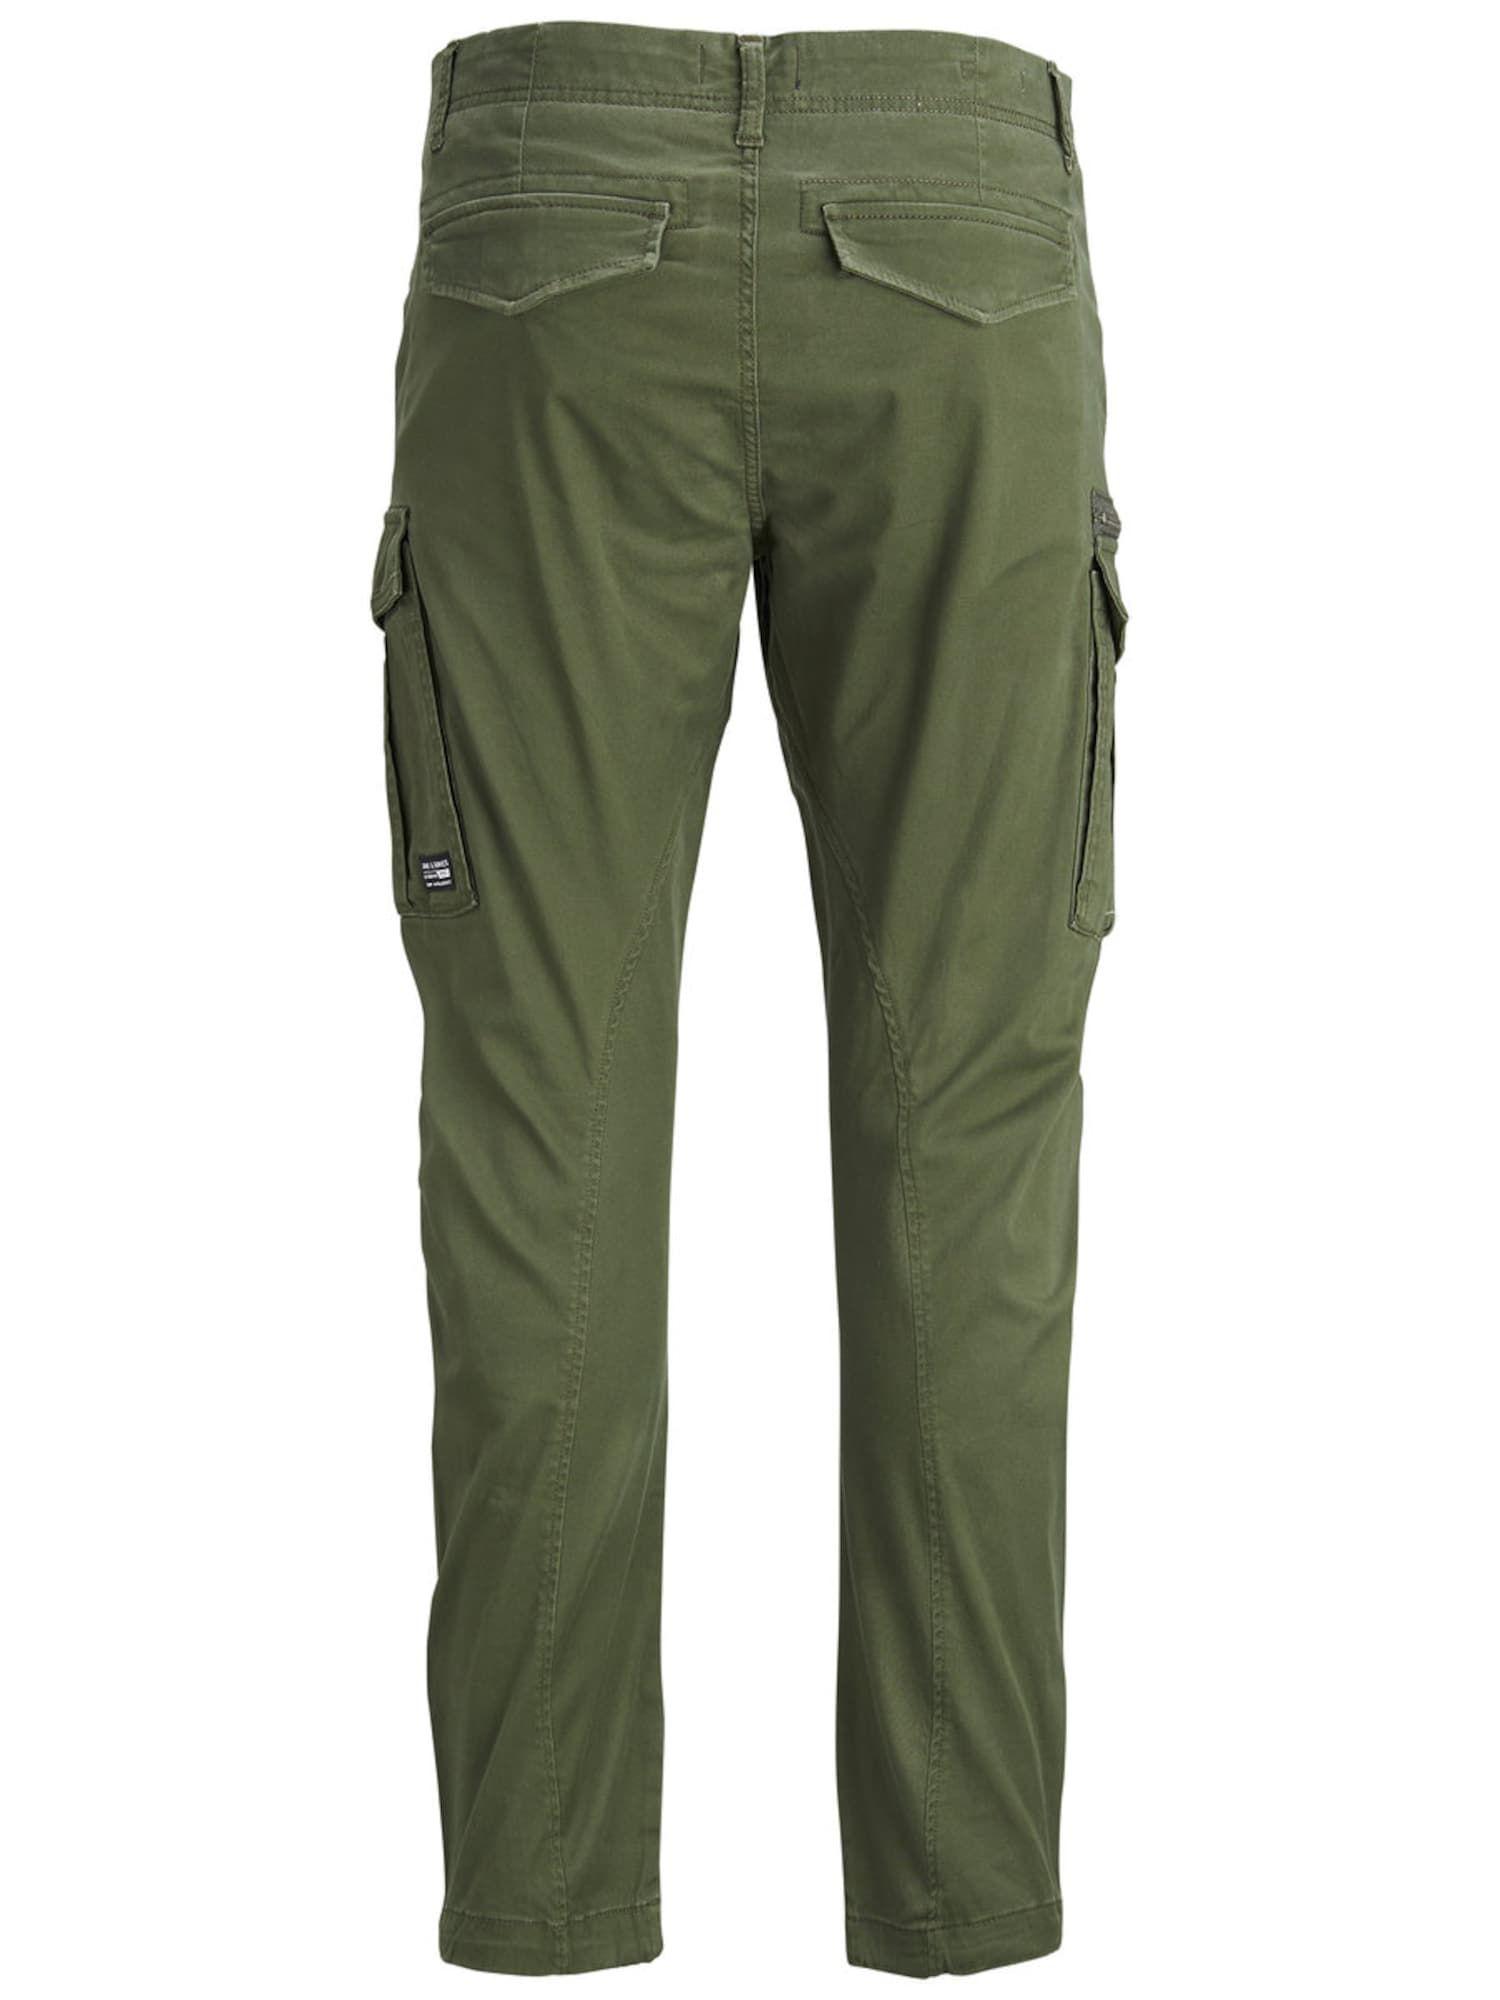 JACK & JONES Chino 'DRAKE CHOP AKM 574' in grasgrün #jeansplus